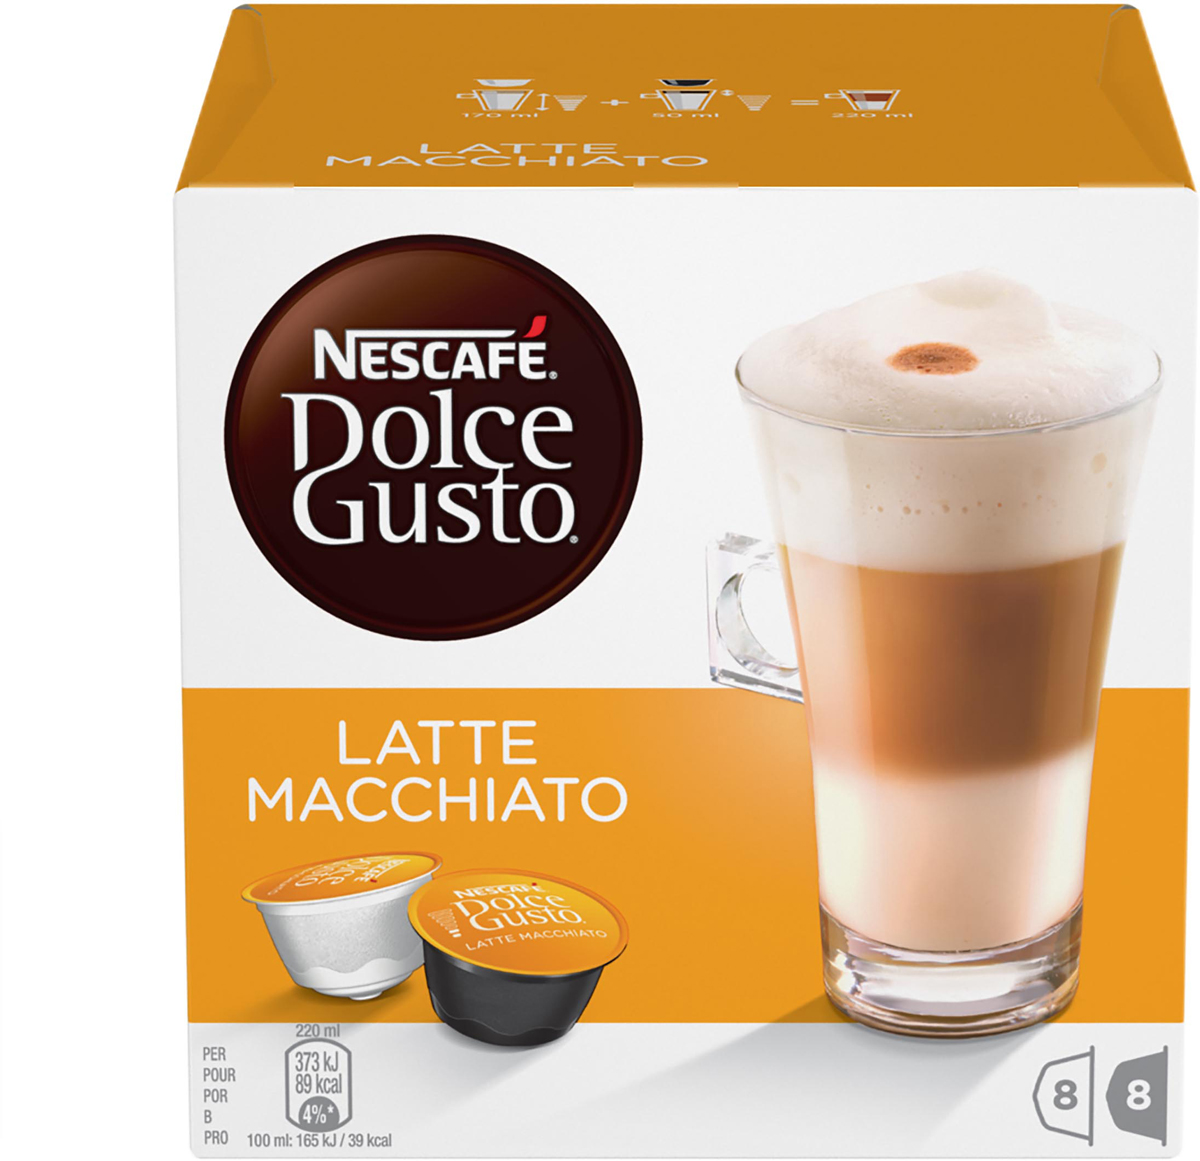 Nescafe Dolce Gusto Latte Macchiato кофе в капсулах, 16 шт кофе nescafe dolce gusto latte macchiato капсульный